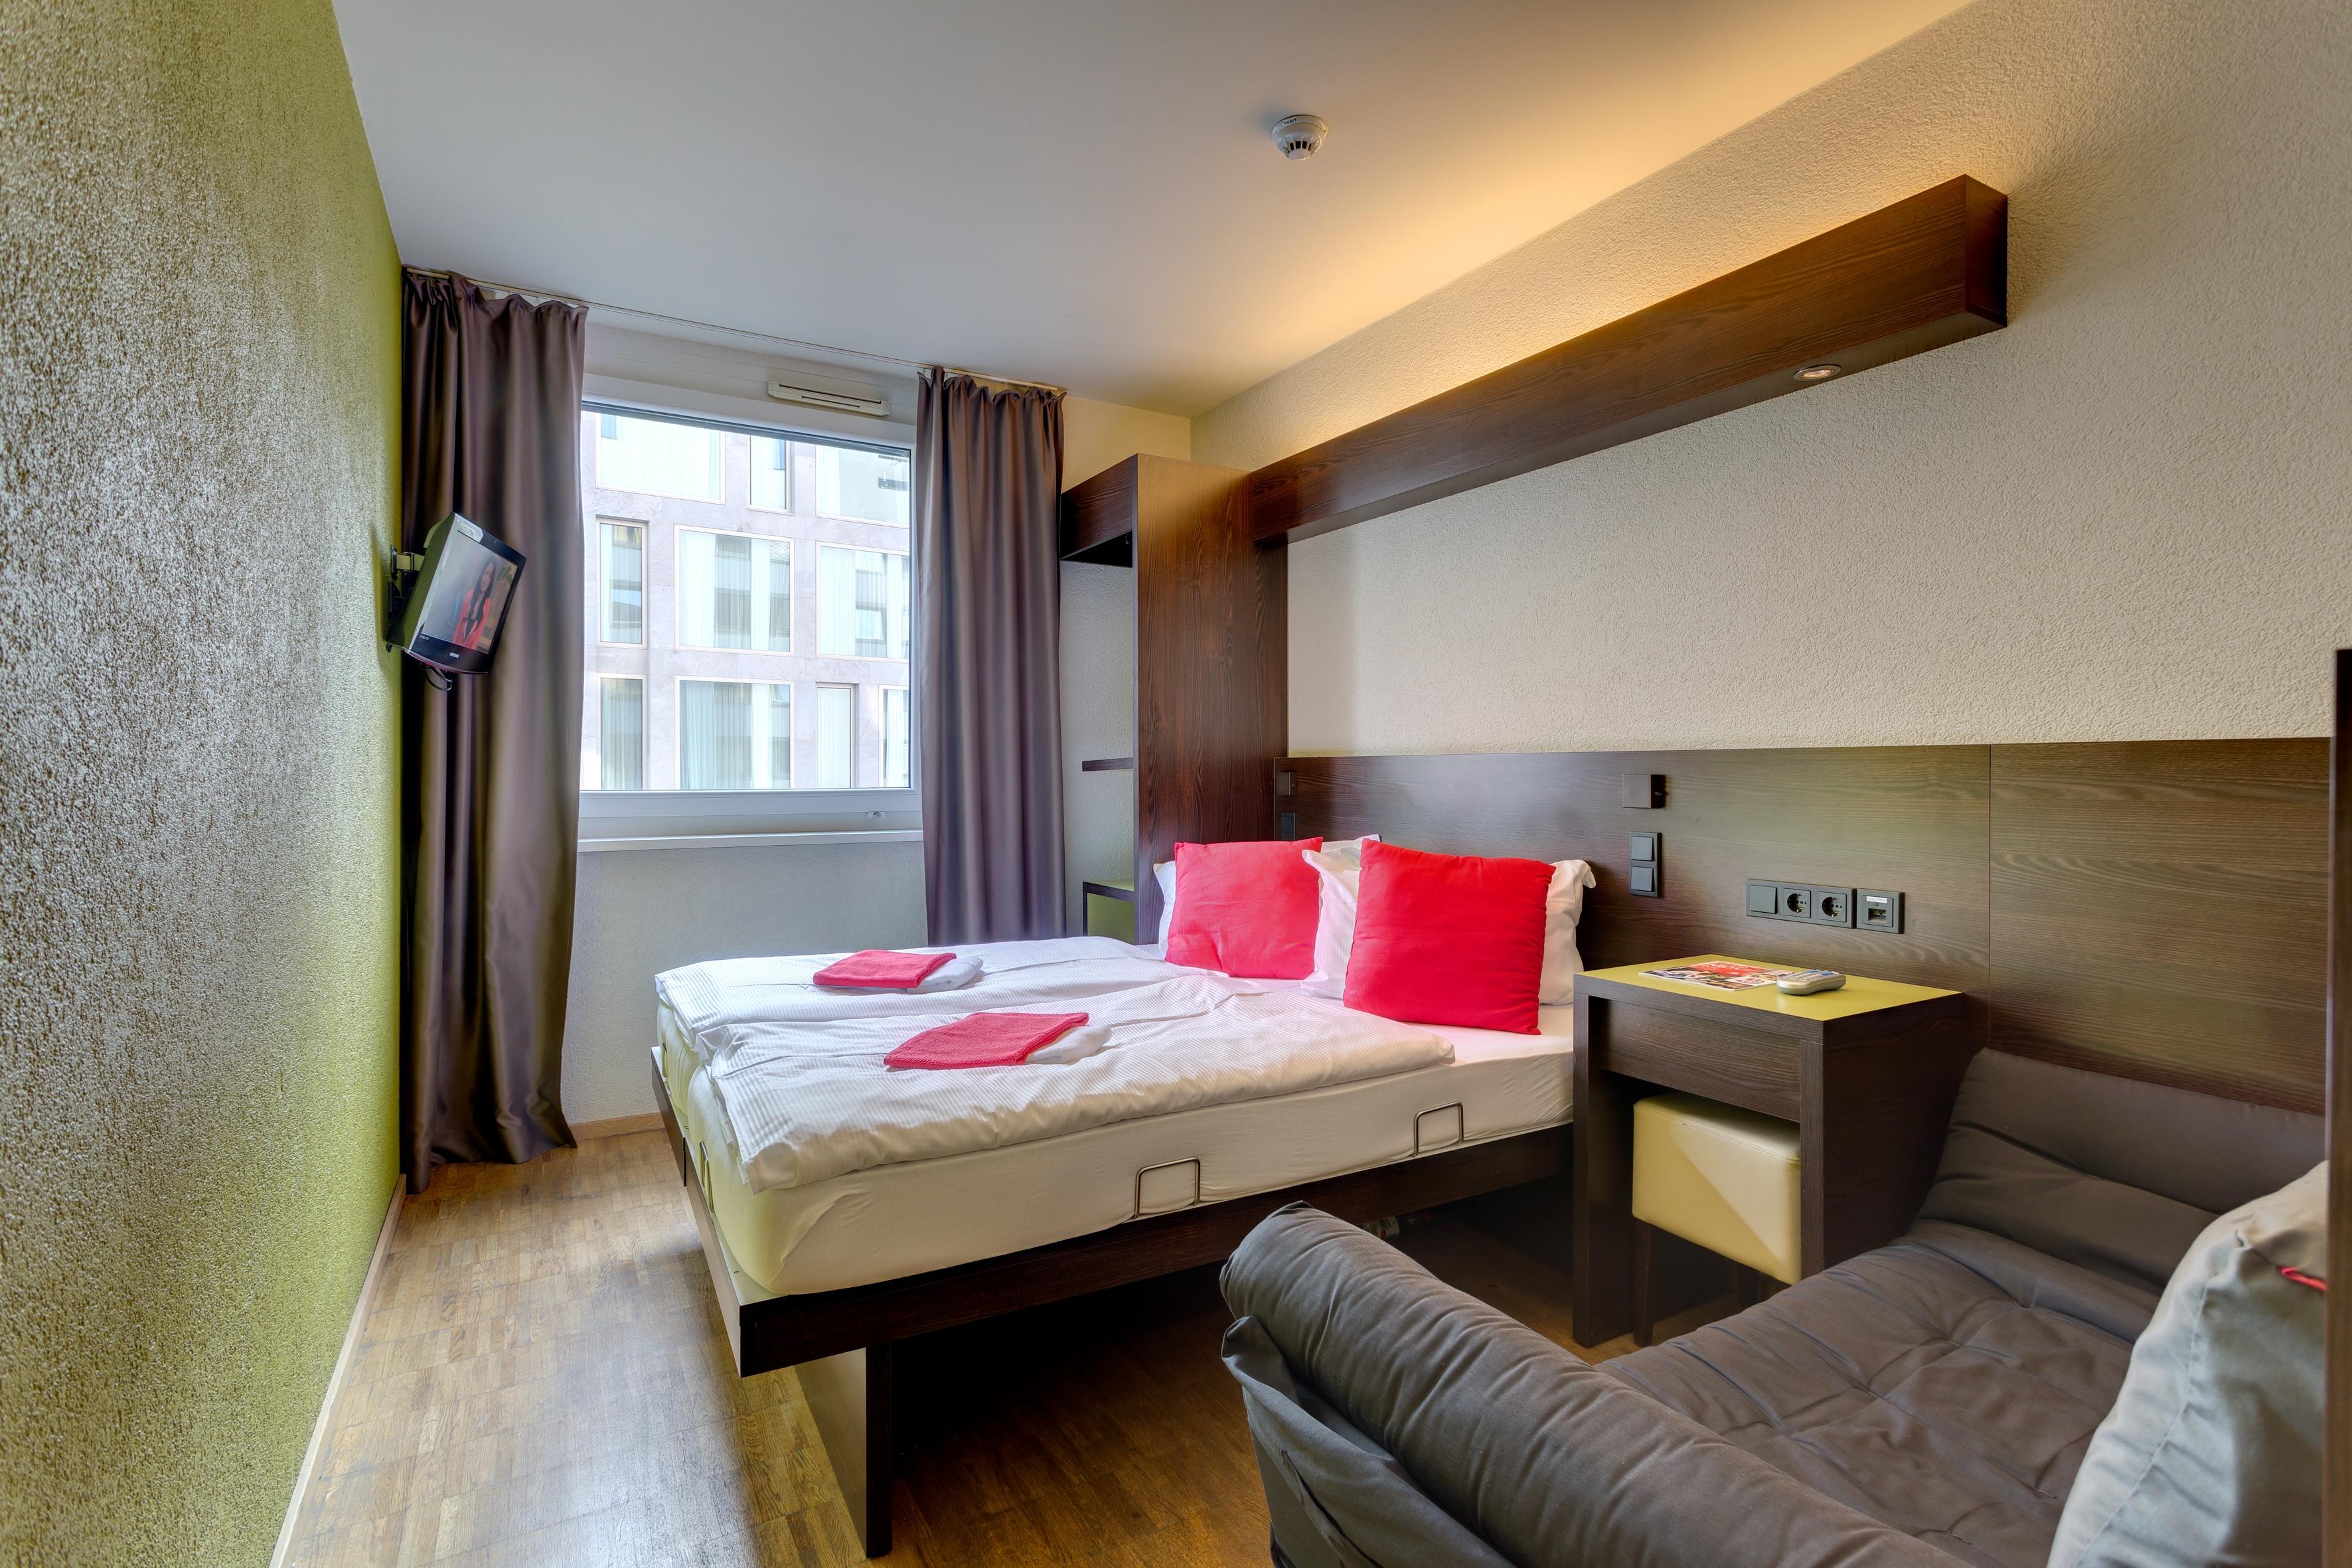 MEININGER Hotel Berlin Central Station - Single-/ Double Room